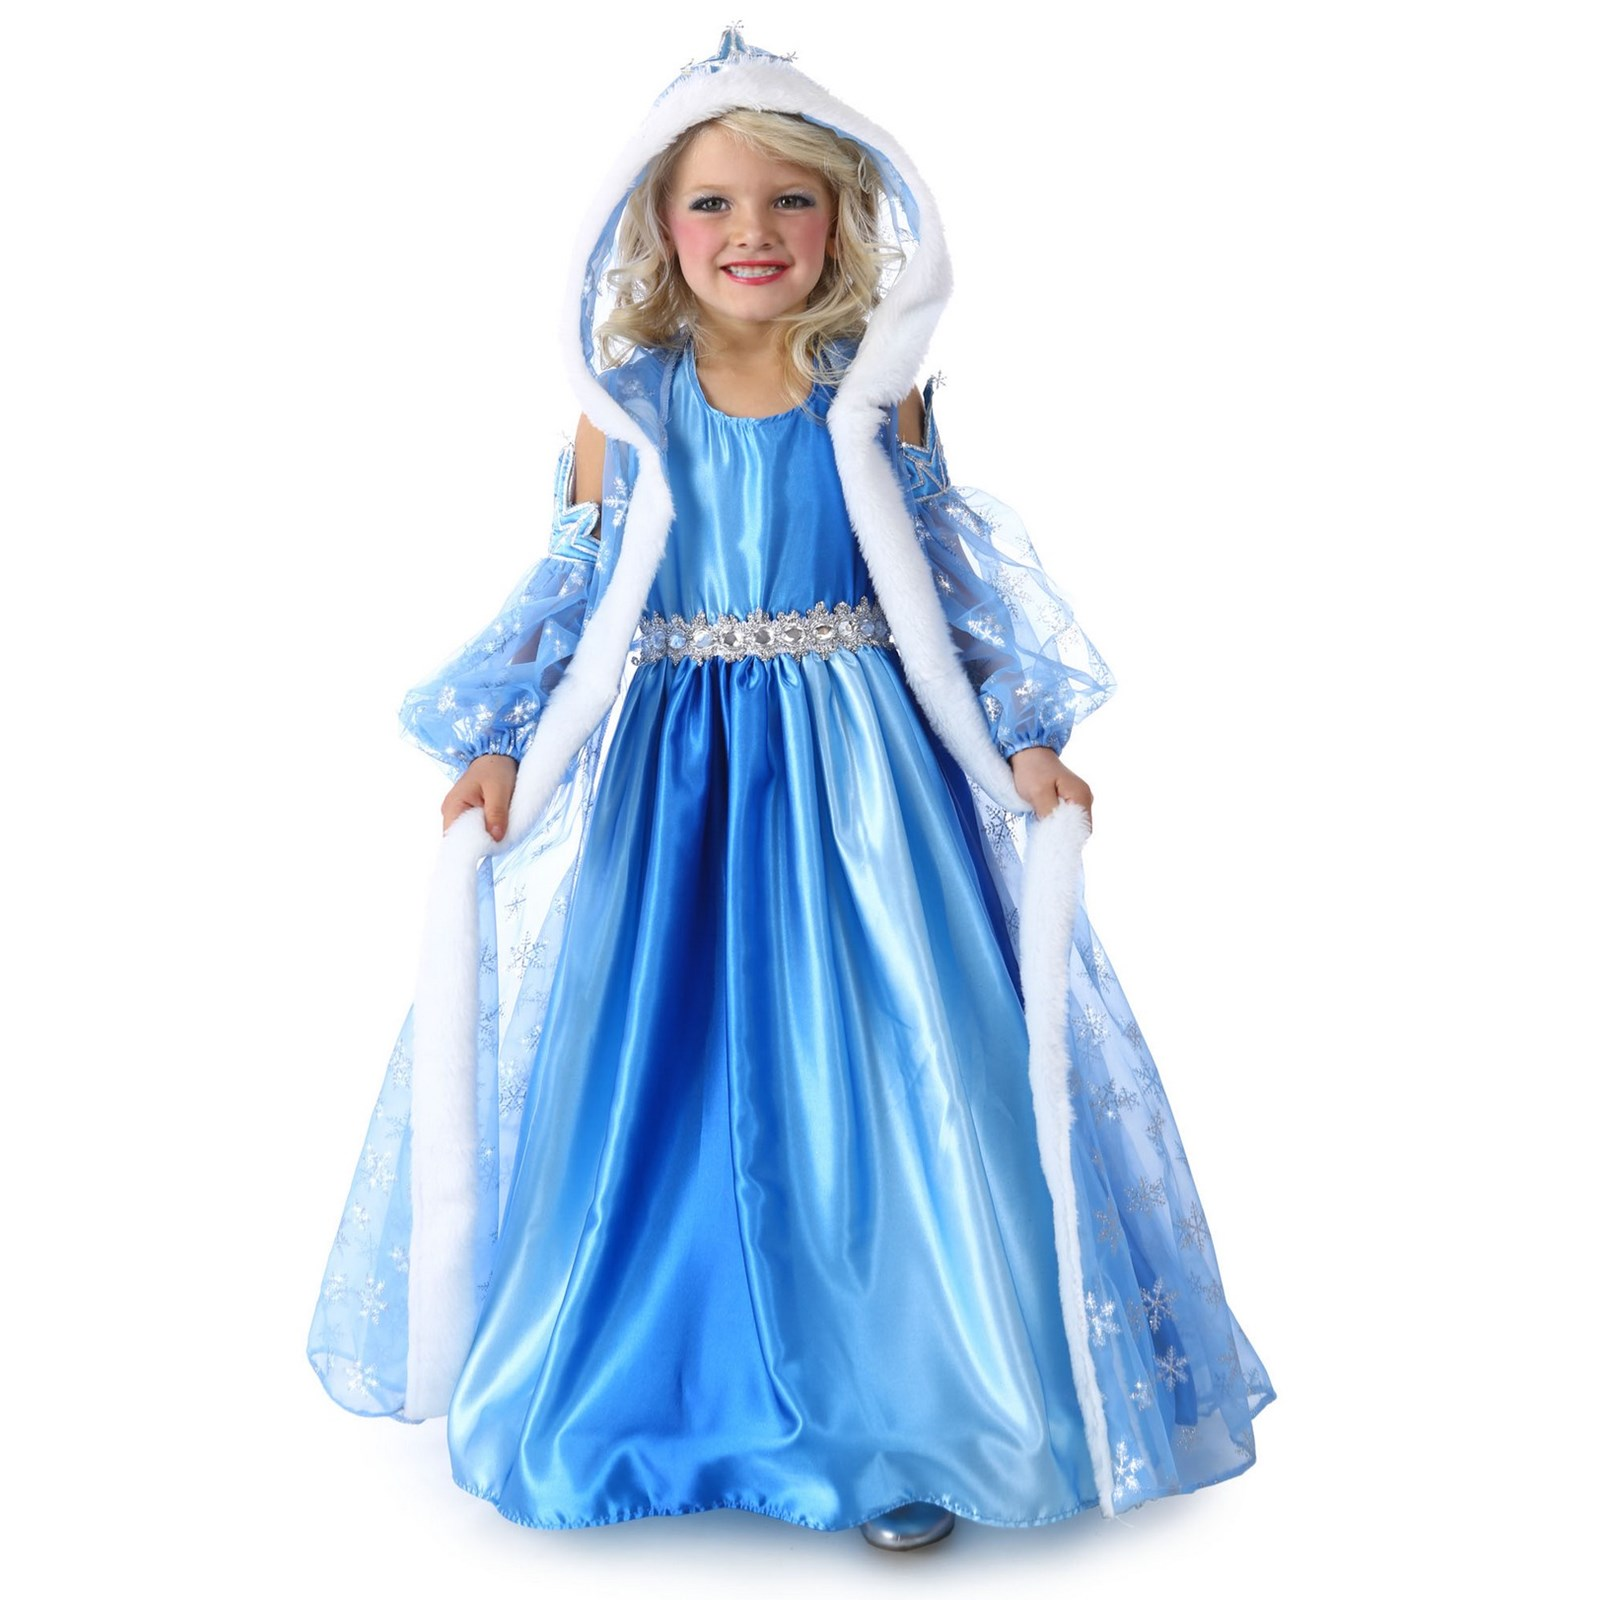 Child Icelyn Winter Princess Halloween Costume